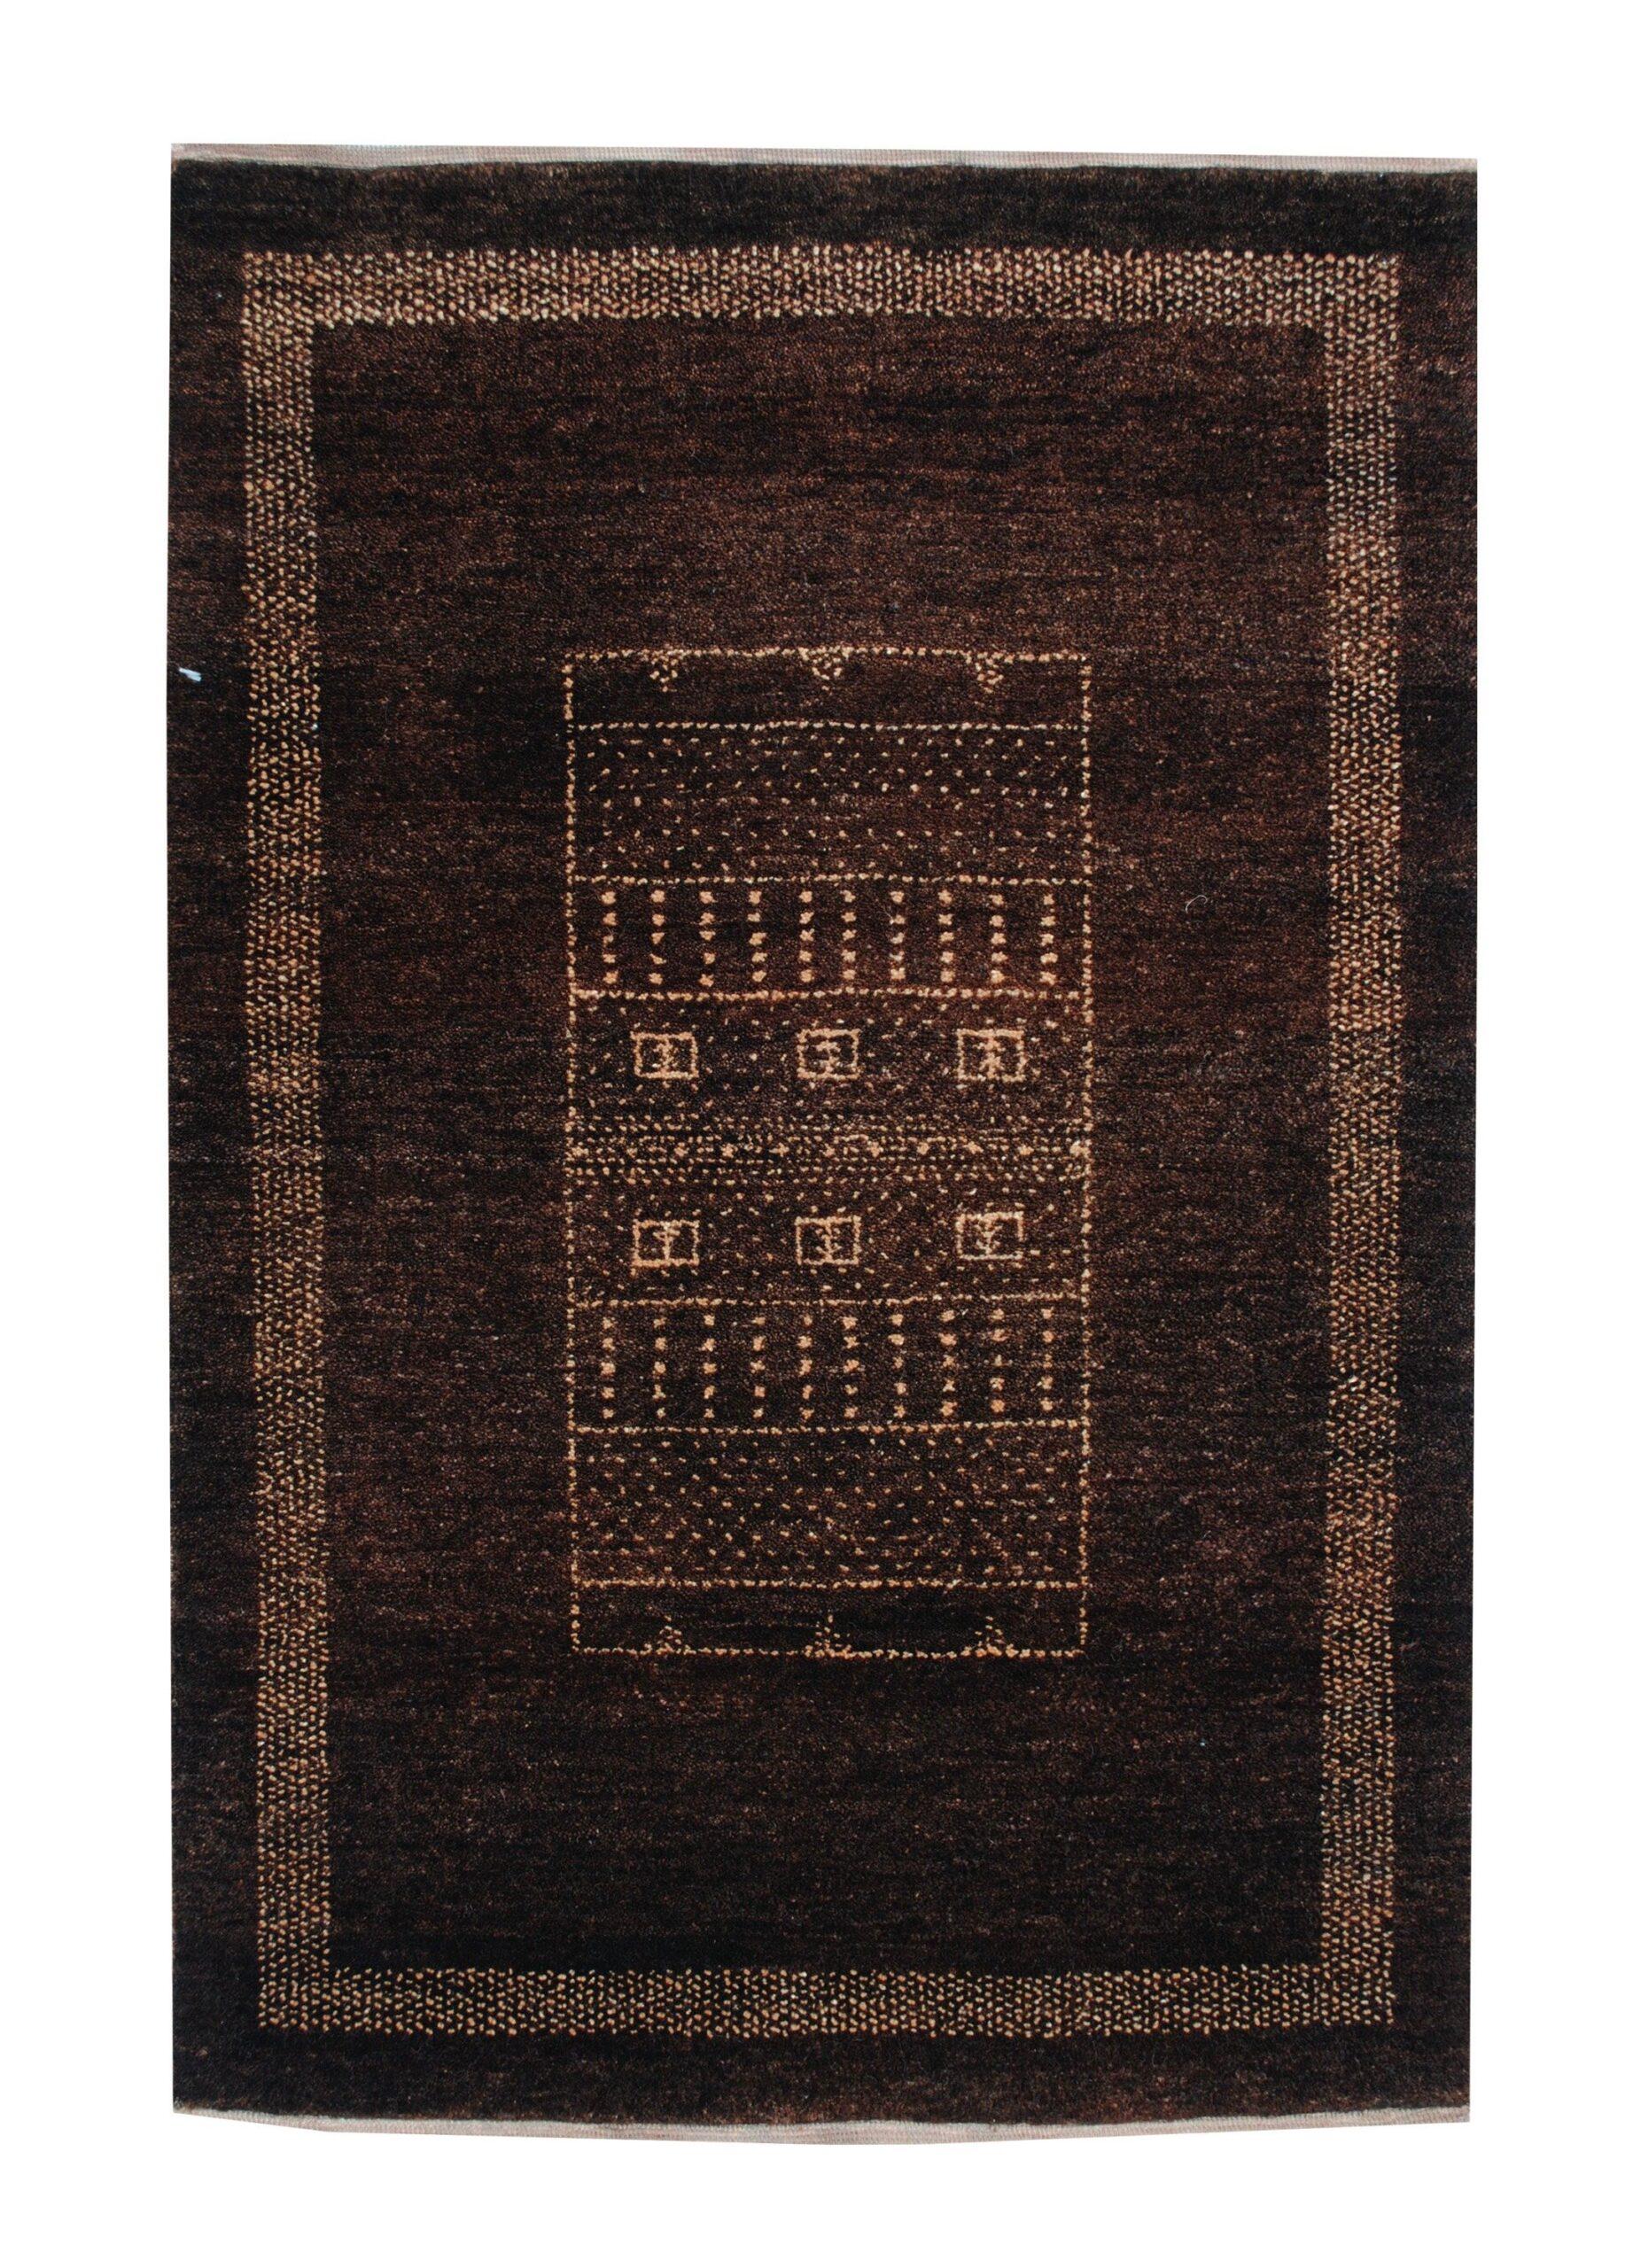 Gabbeh 2' x 3' Handmade Area Rug - Shabahang Royal Carpet